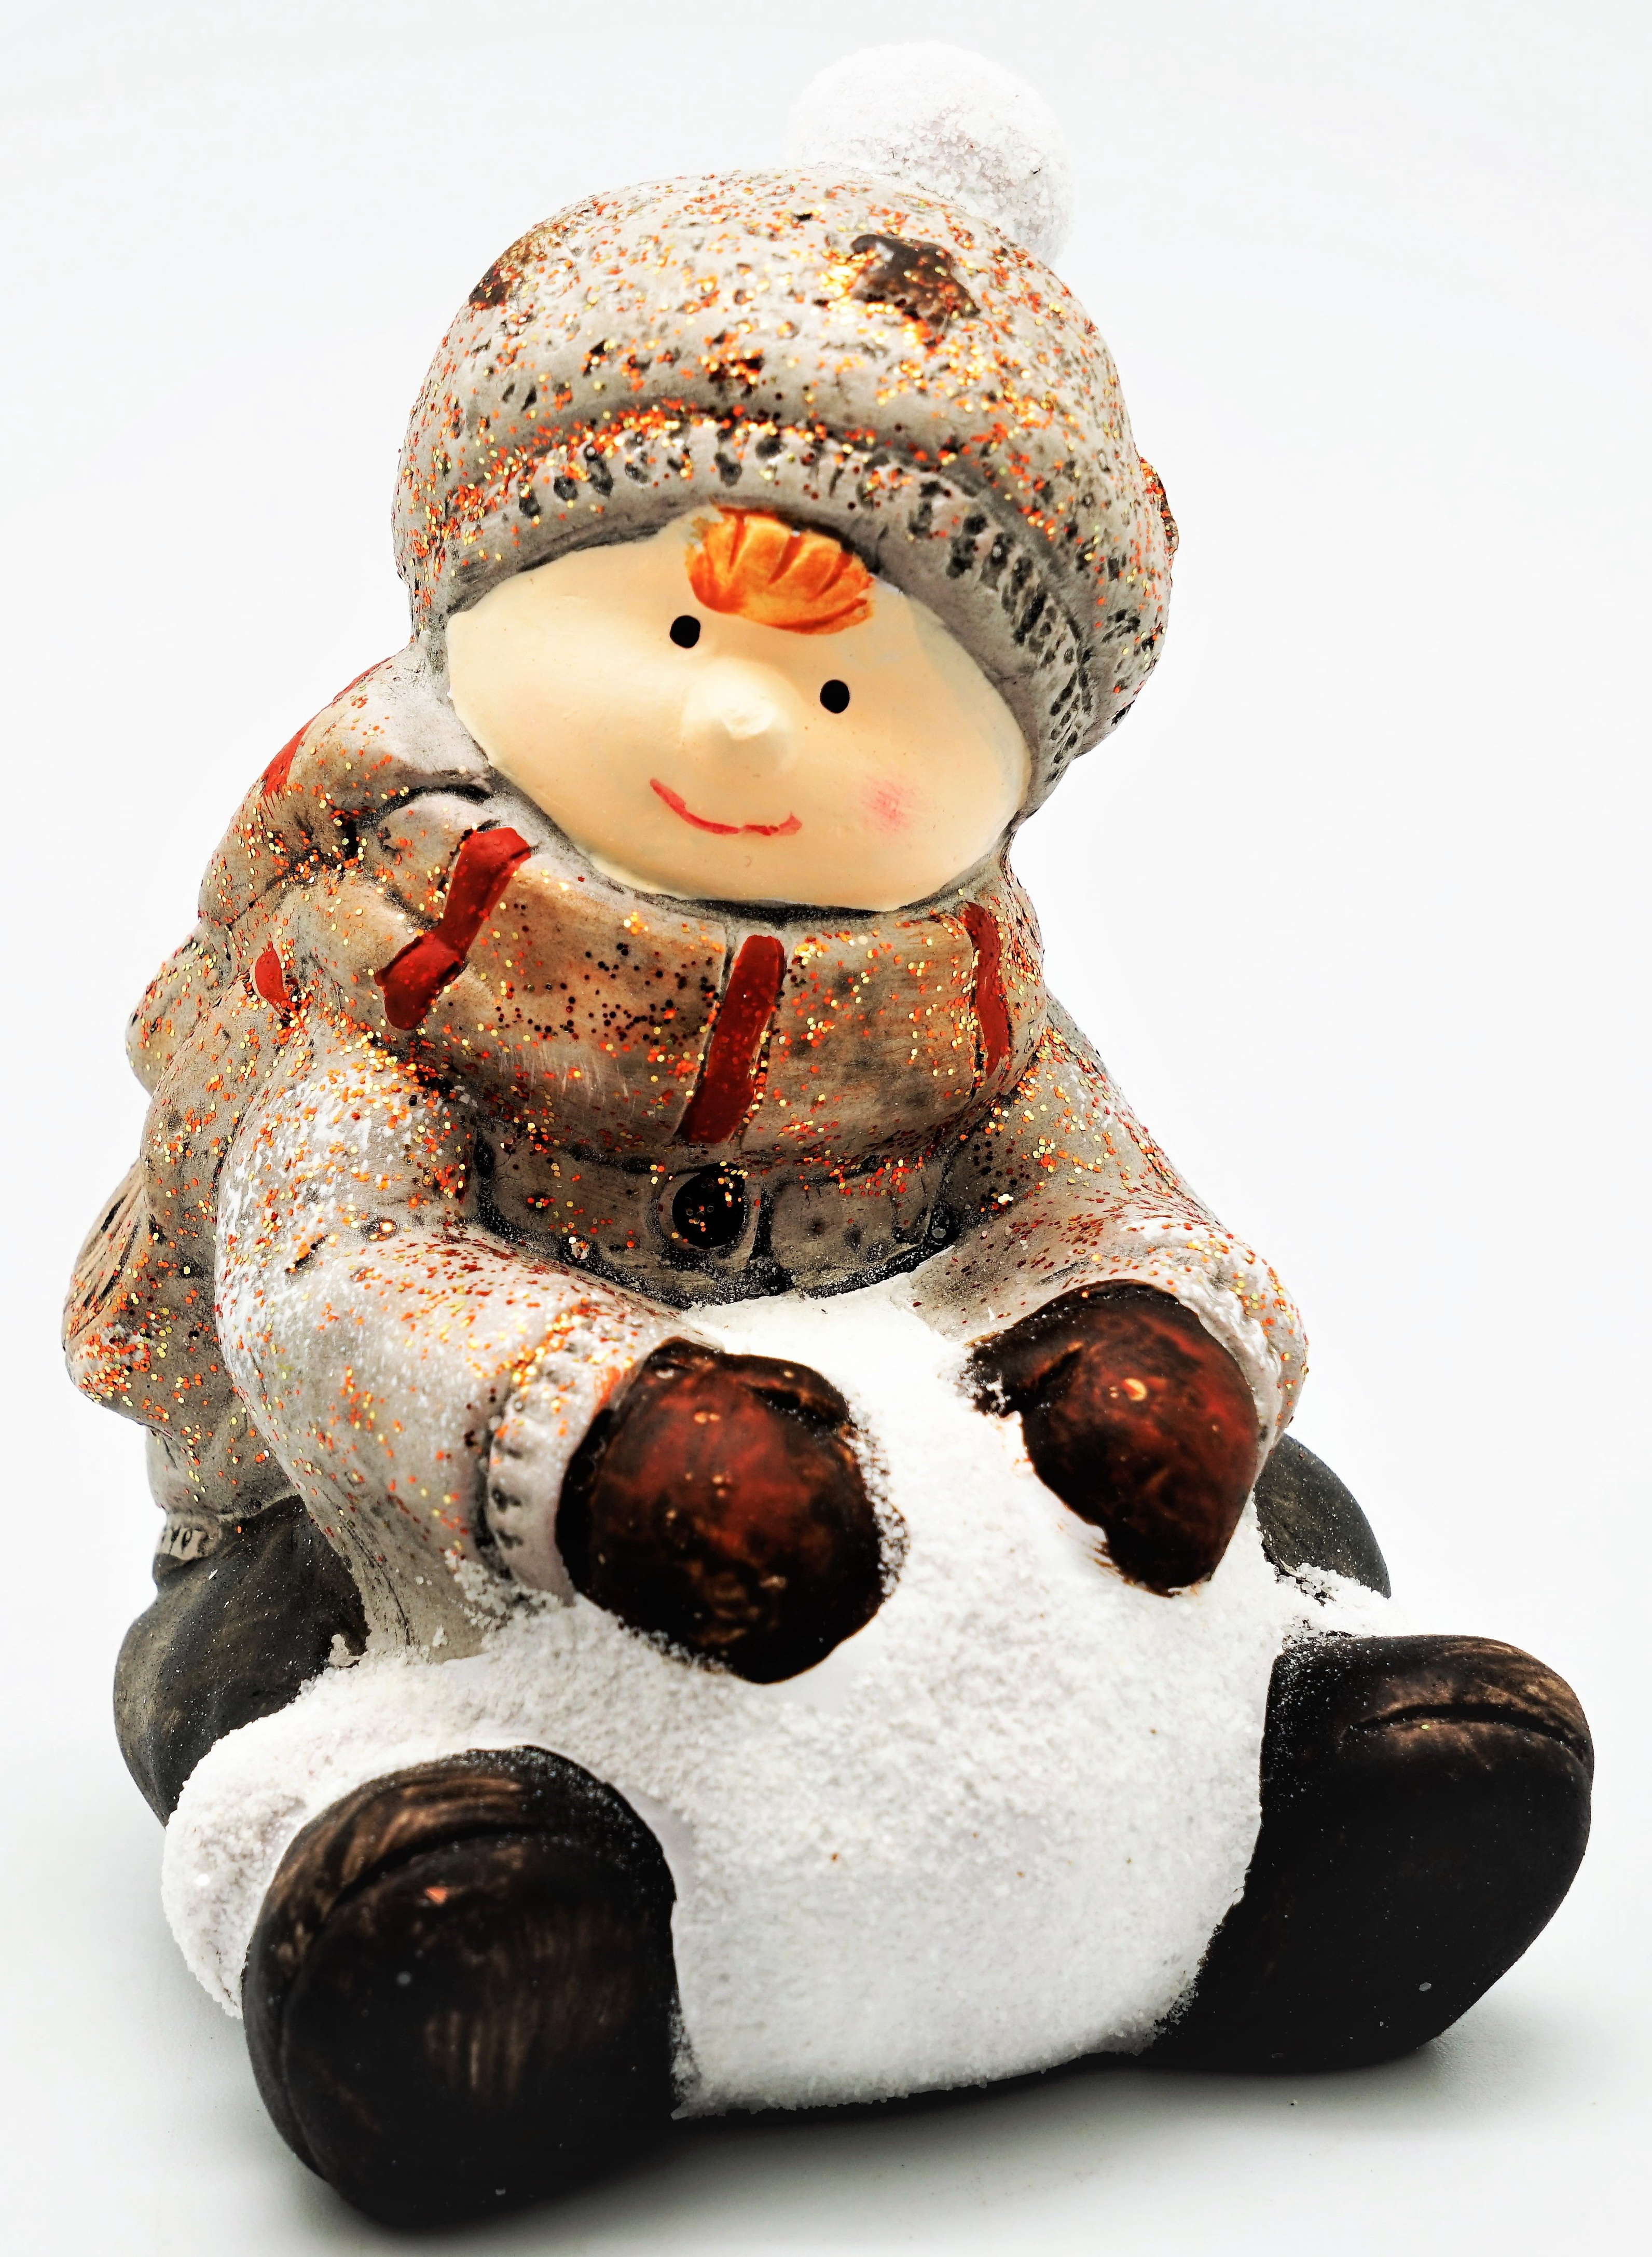 Сувенир Яркий Праздник Мальчик со снежком, 10 х 9 х 13,5 см лекарство валз 80 инструкция